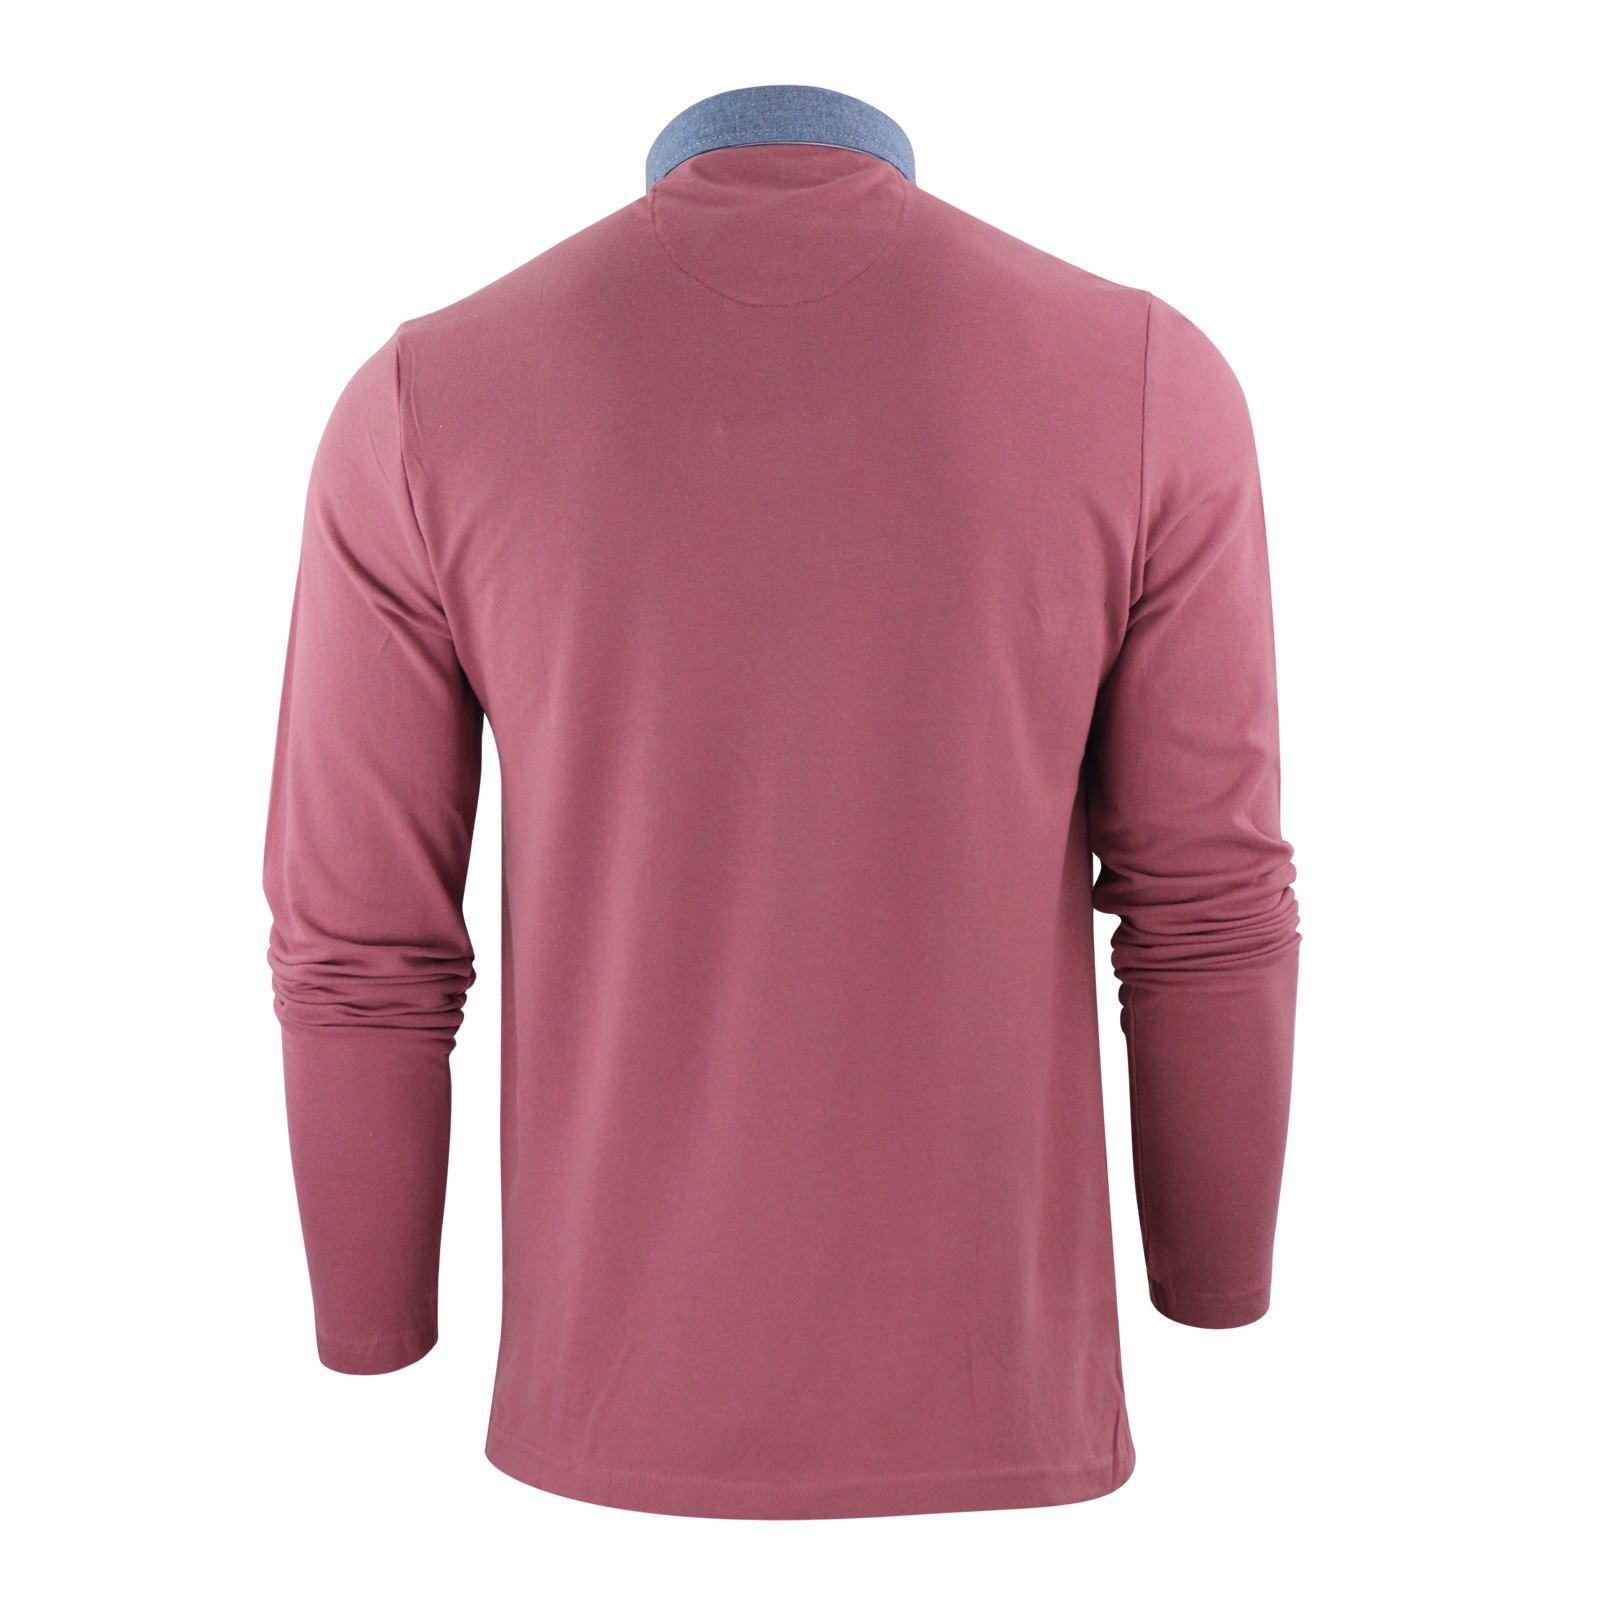 Para-Hombre-Polo-T-Shirt-Alma-valiente-Hera-Manga-Larga-De-Algodon-Casual-Top miniatura 21